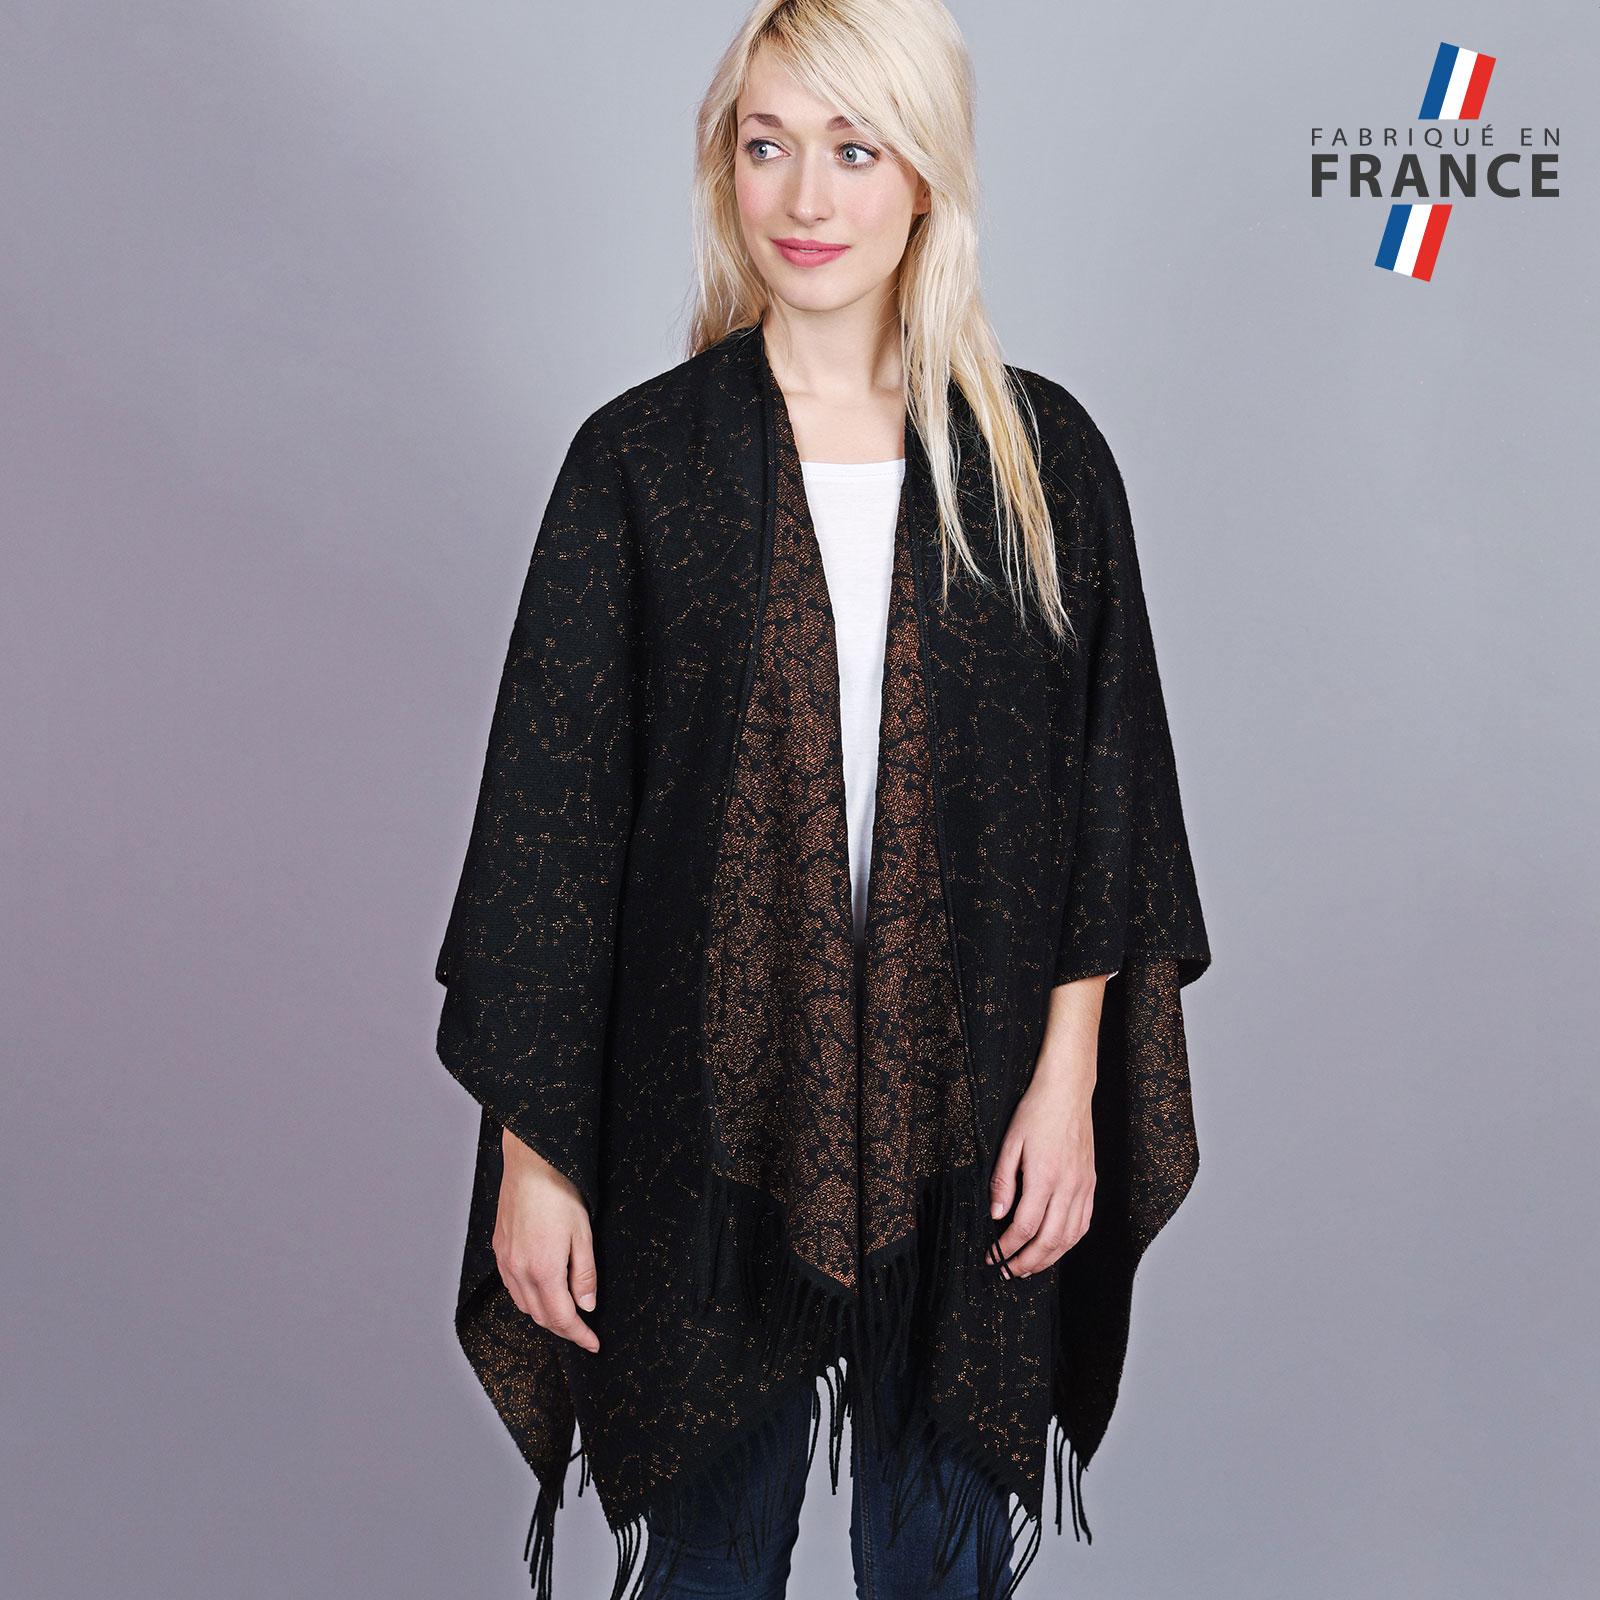 AT-04447-VF16-1-LB_FR-poncho-femme-marron-fabrique-en-france